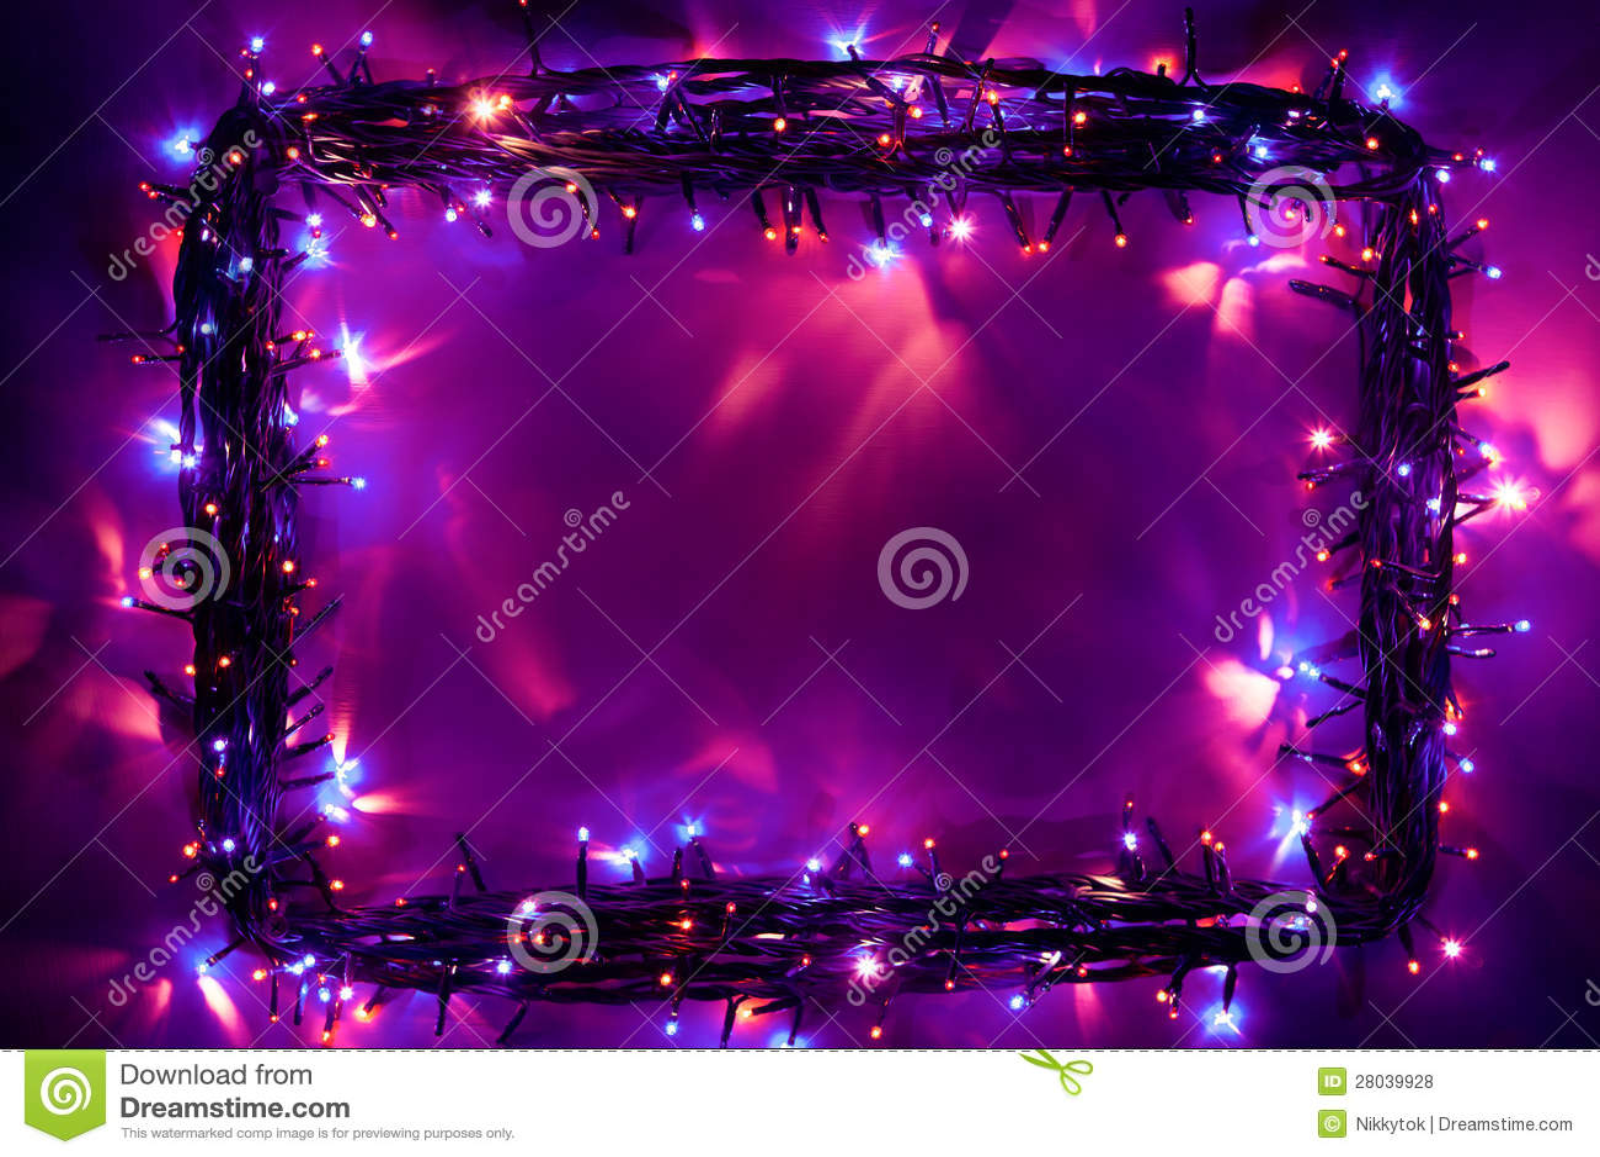 Blue Led Christmas Lights